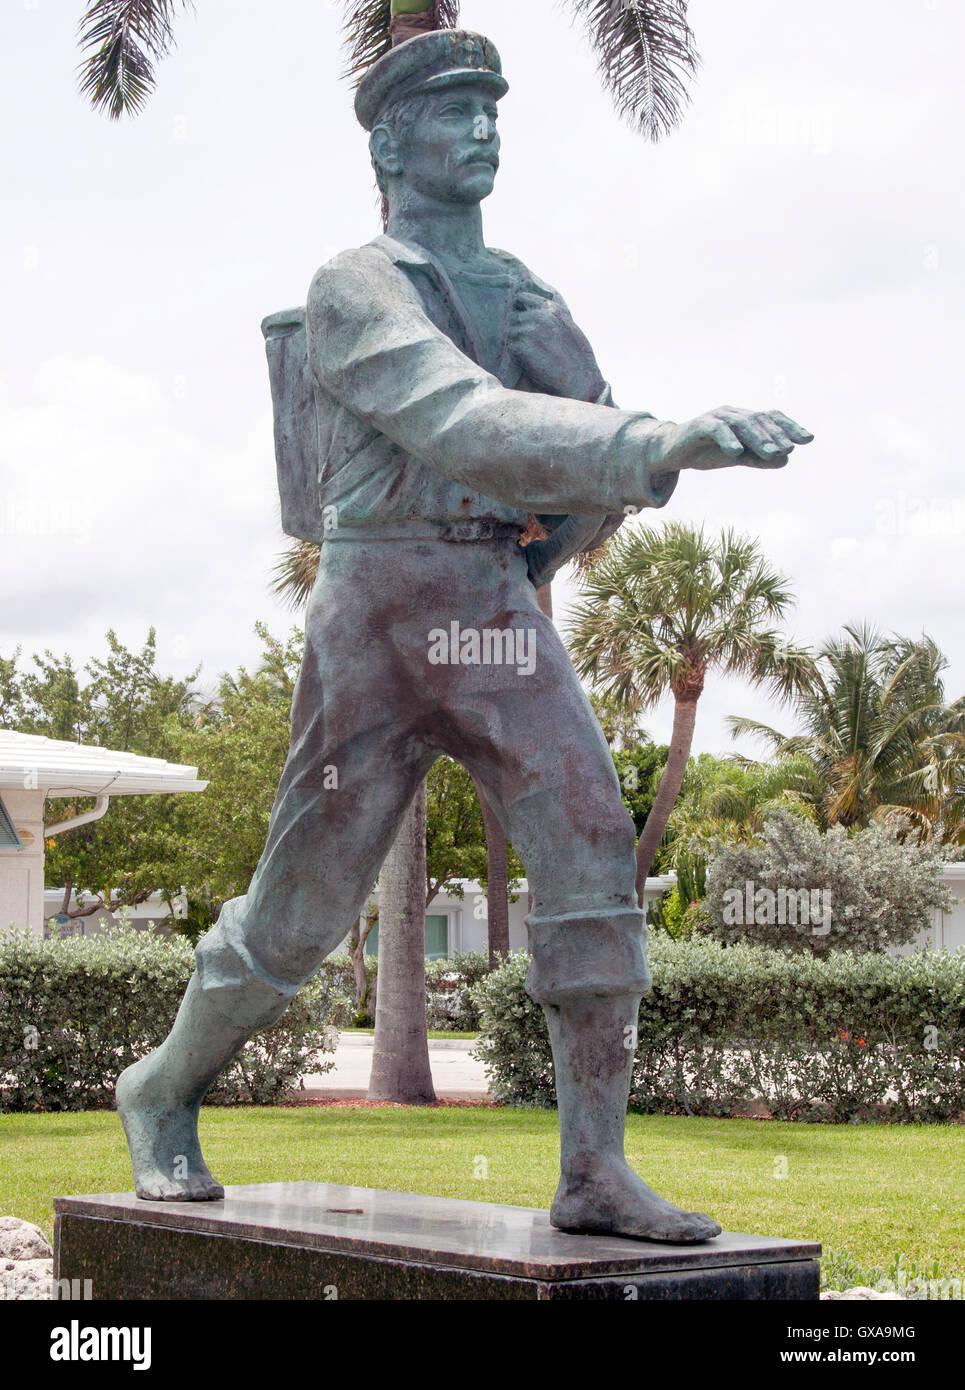 Barefoot Mailman Statue in Hillsboro Beach Florida - Stock Image